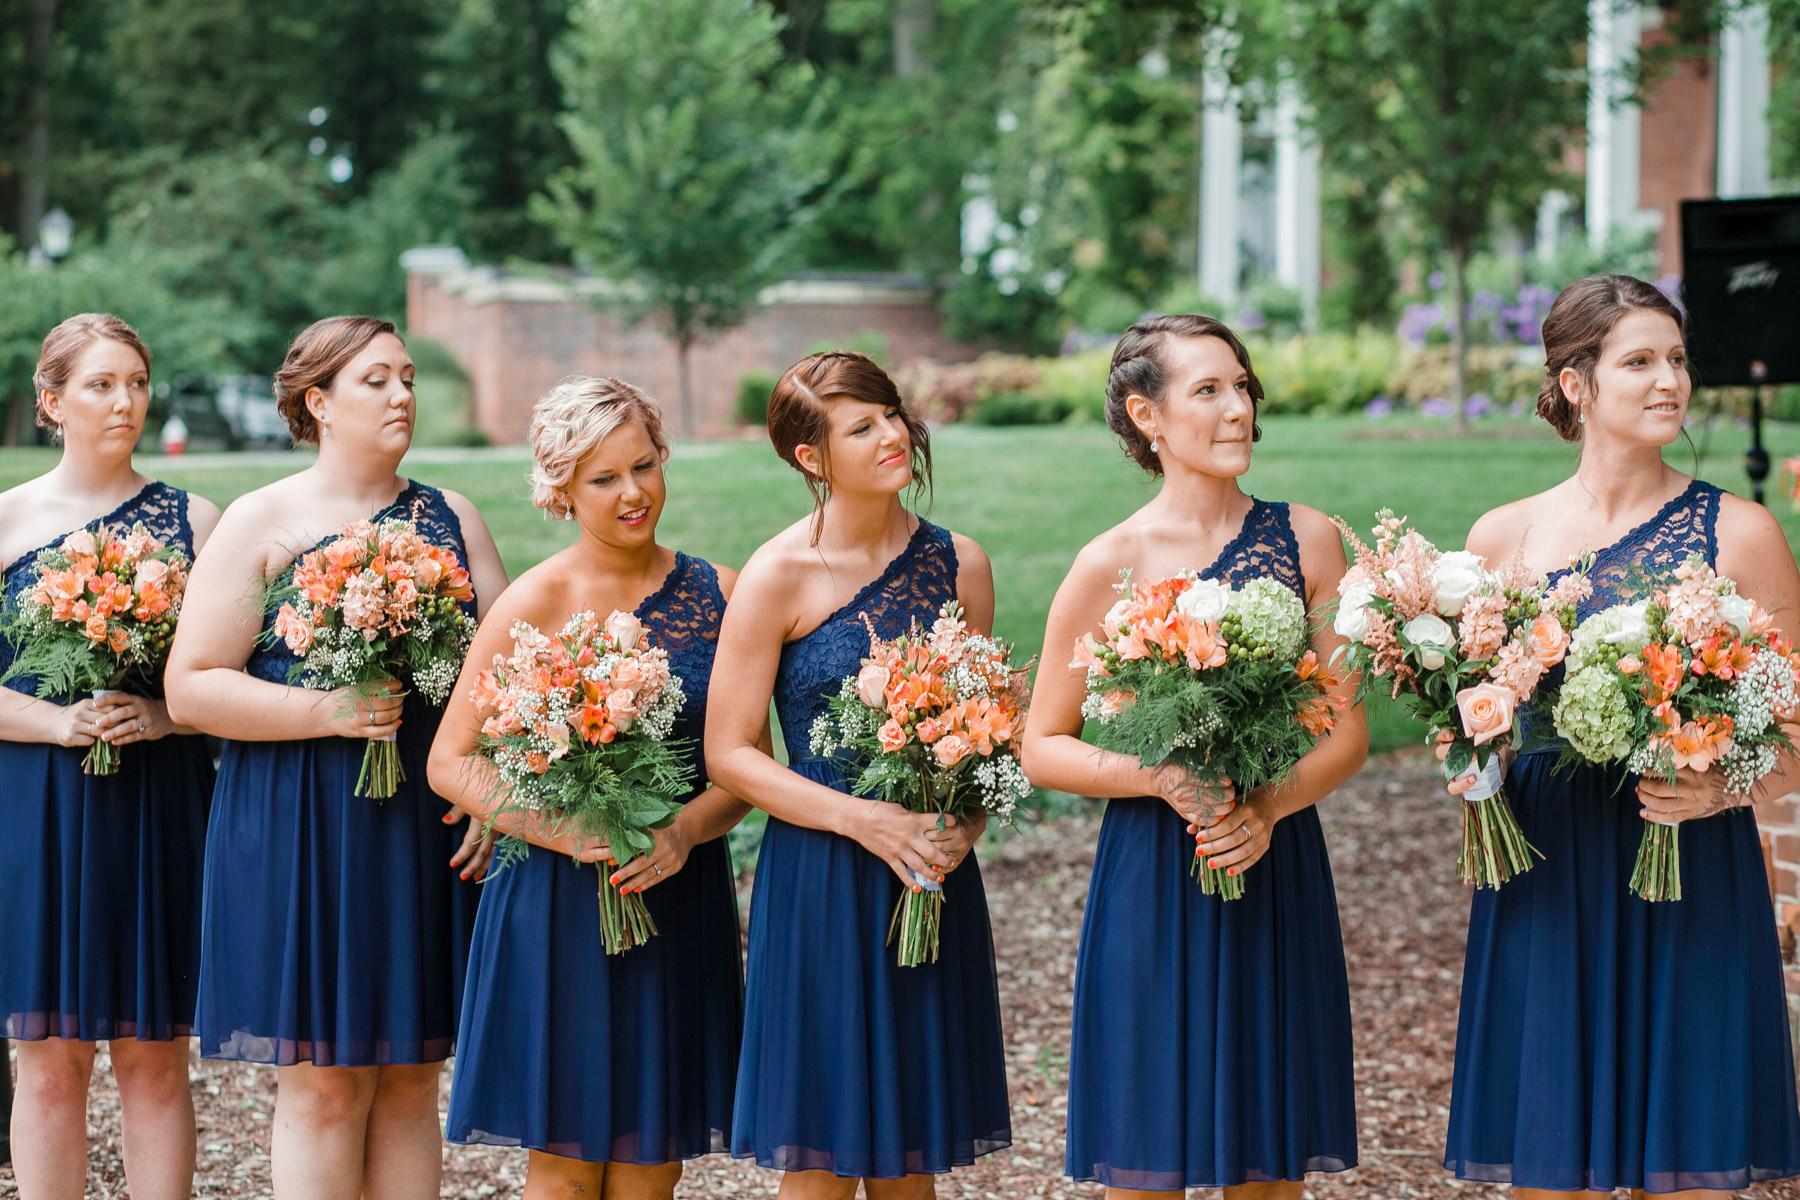 wildwood-park-wedding-photos-42.jpg